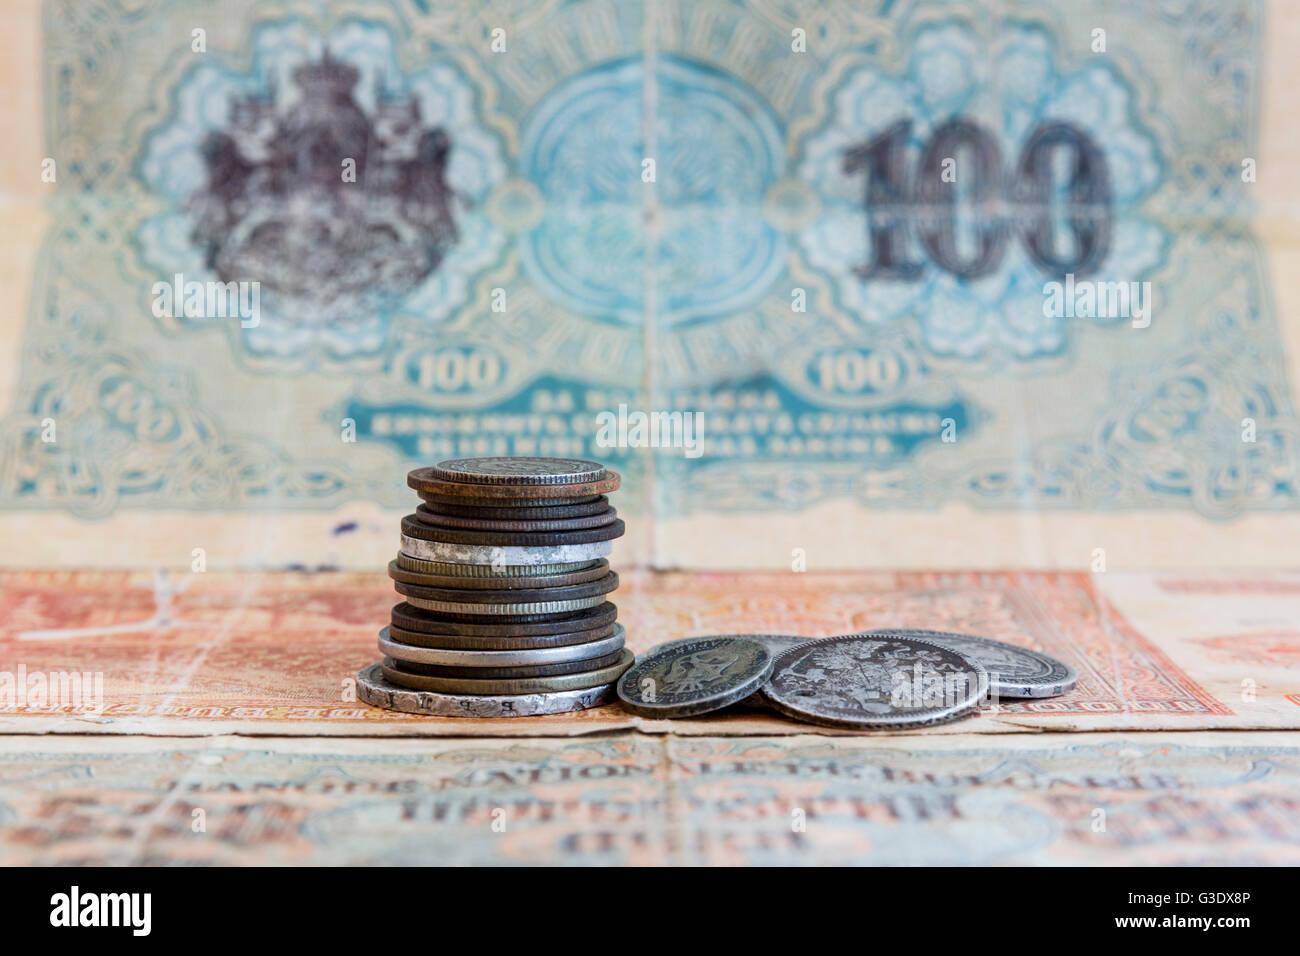 Soviet Union Banknotes Stockfotos & Soviet Union Banknotes Bilder ...